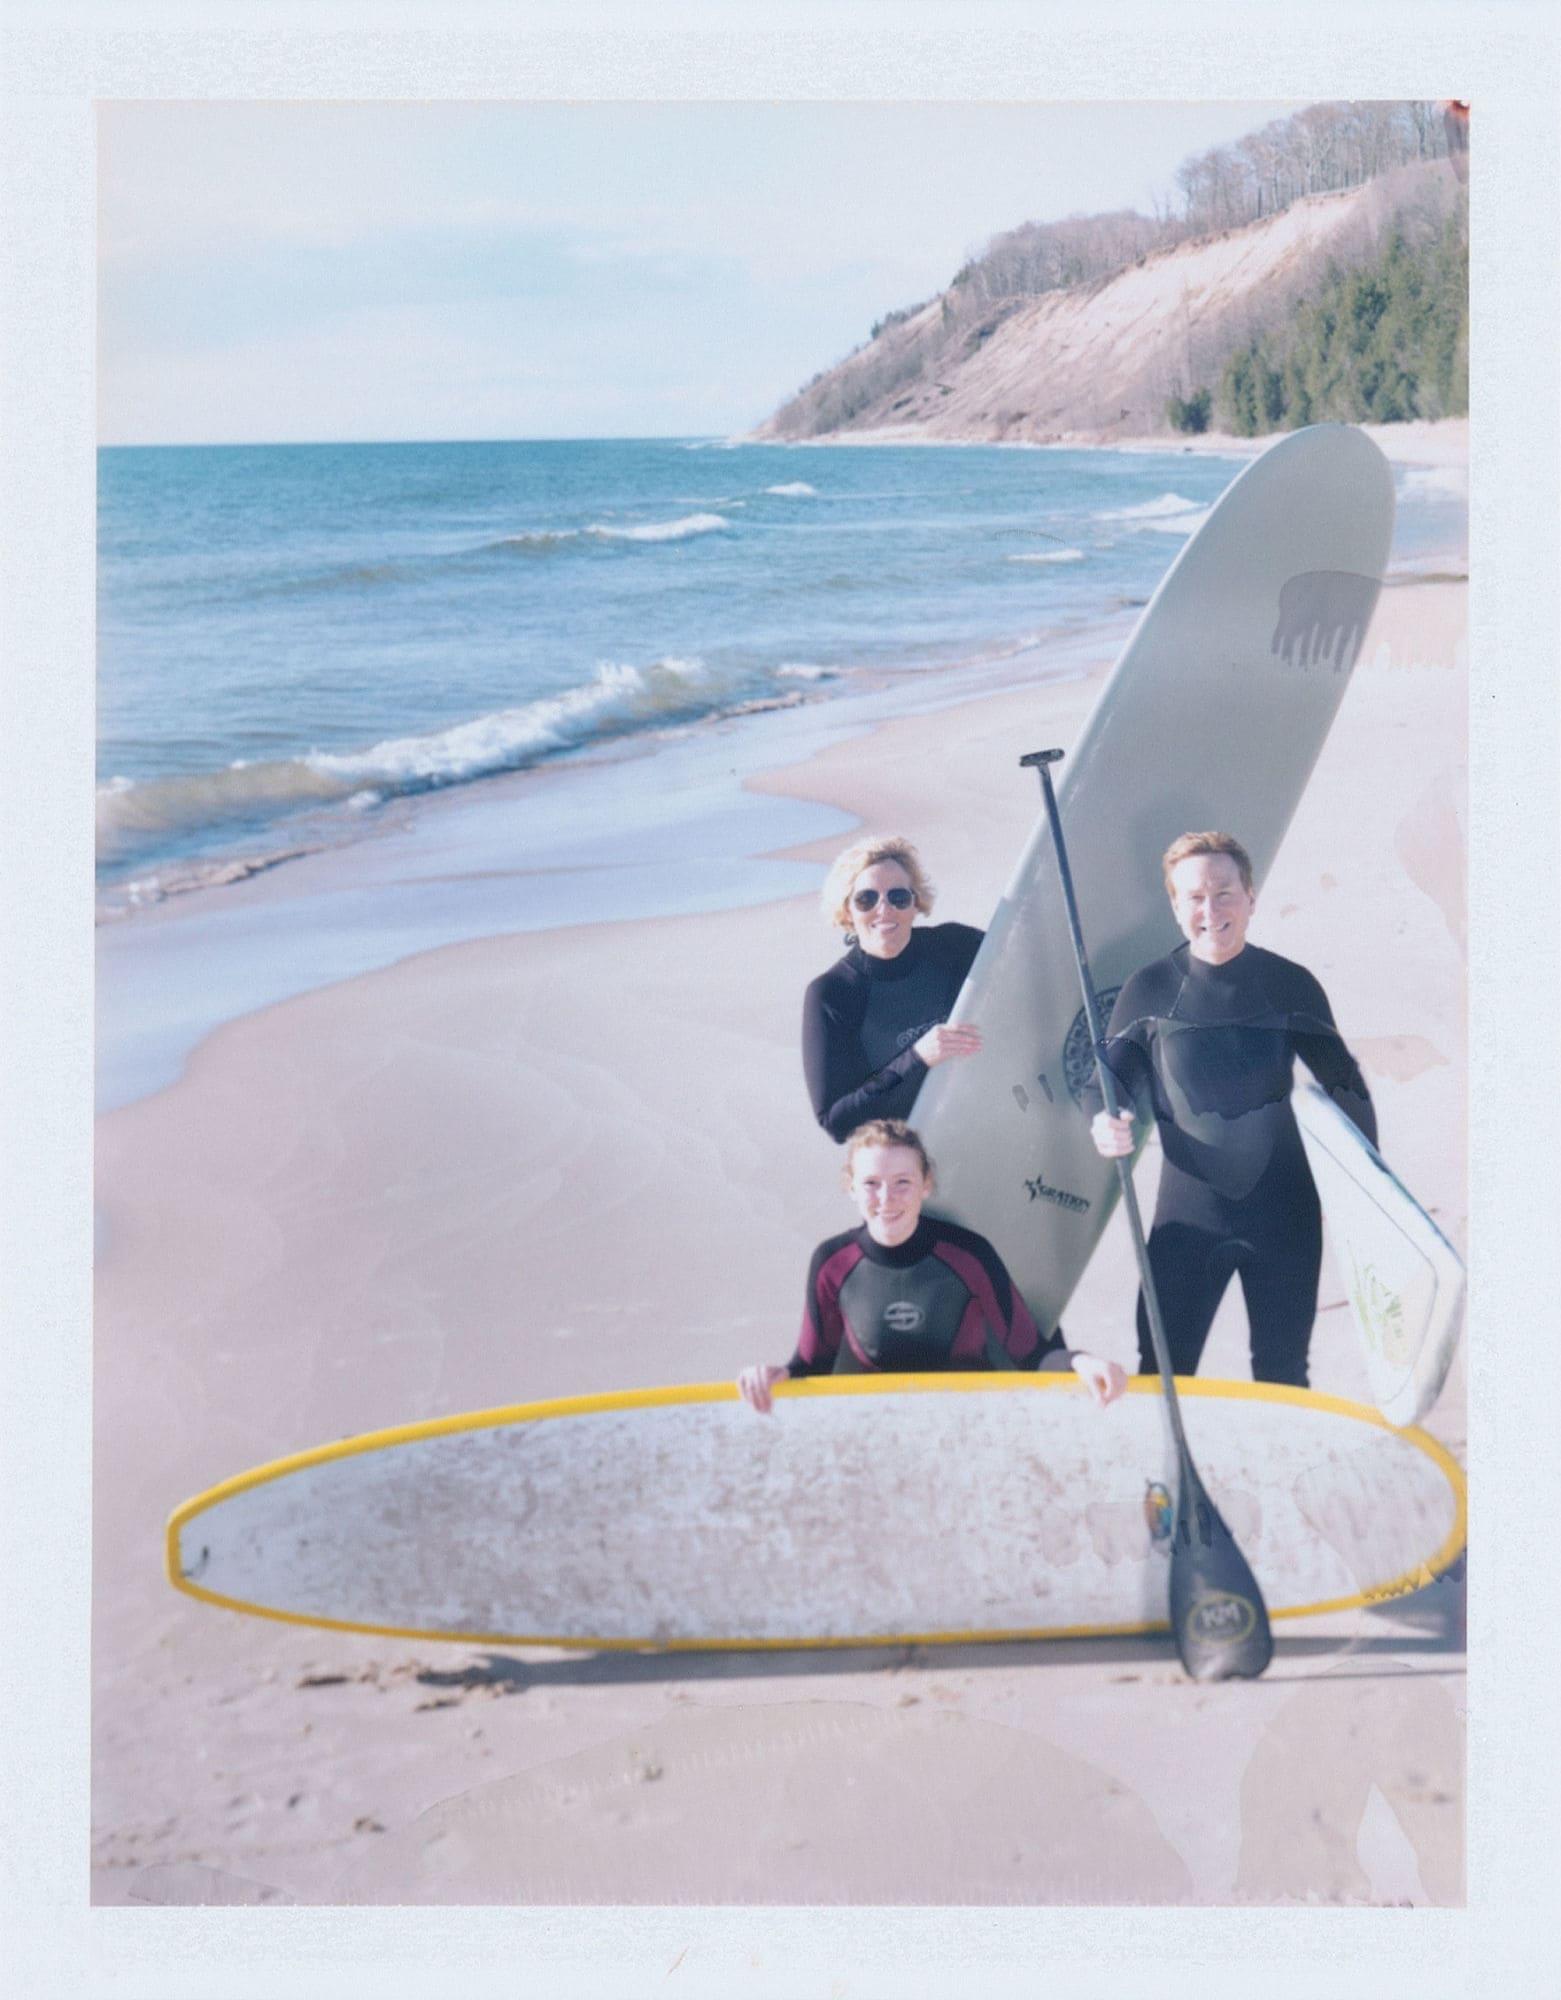 surf-4fnl